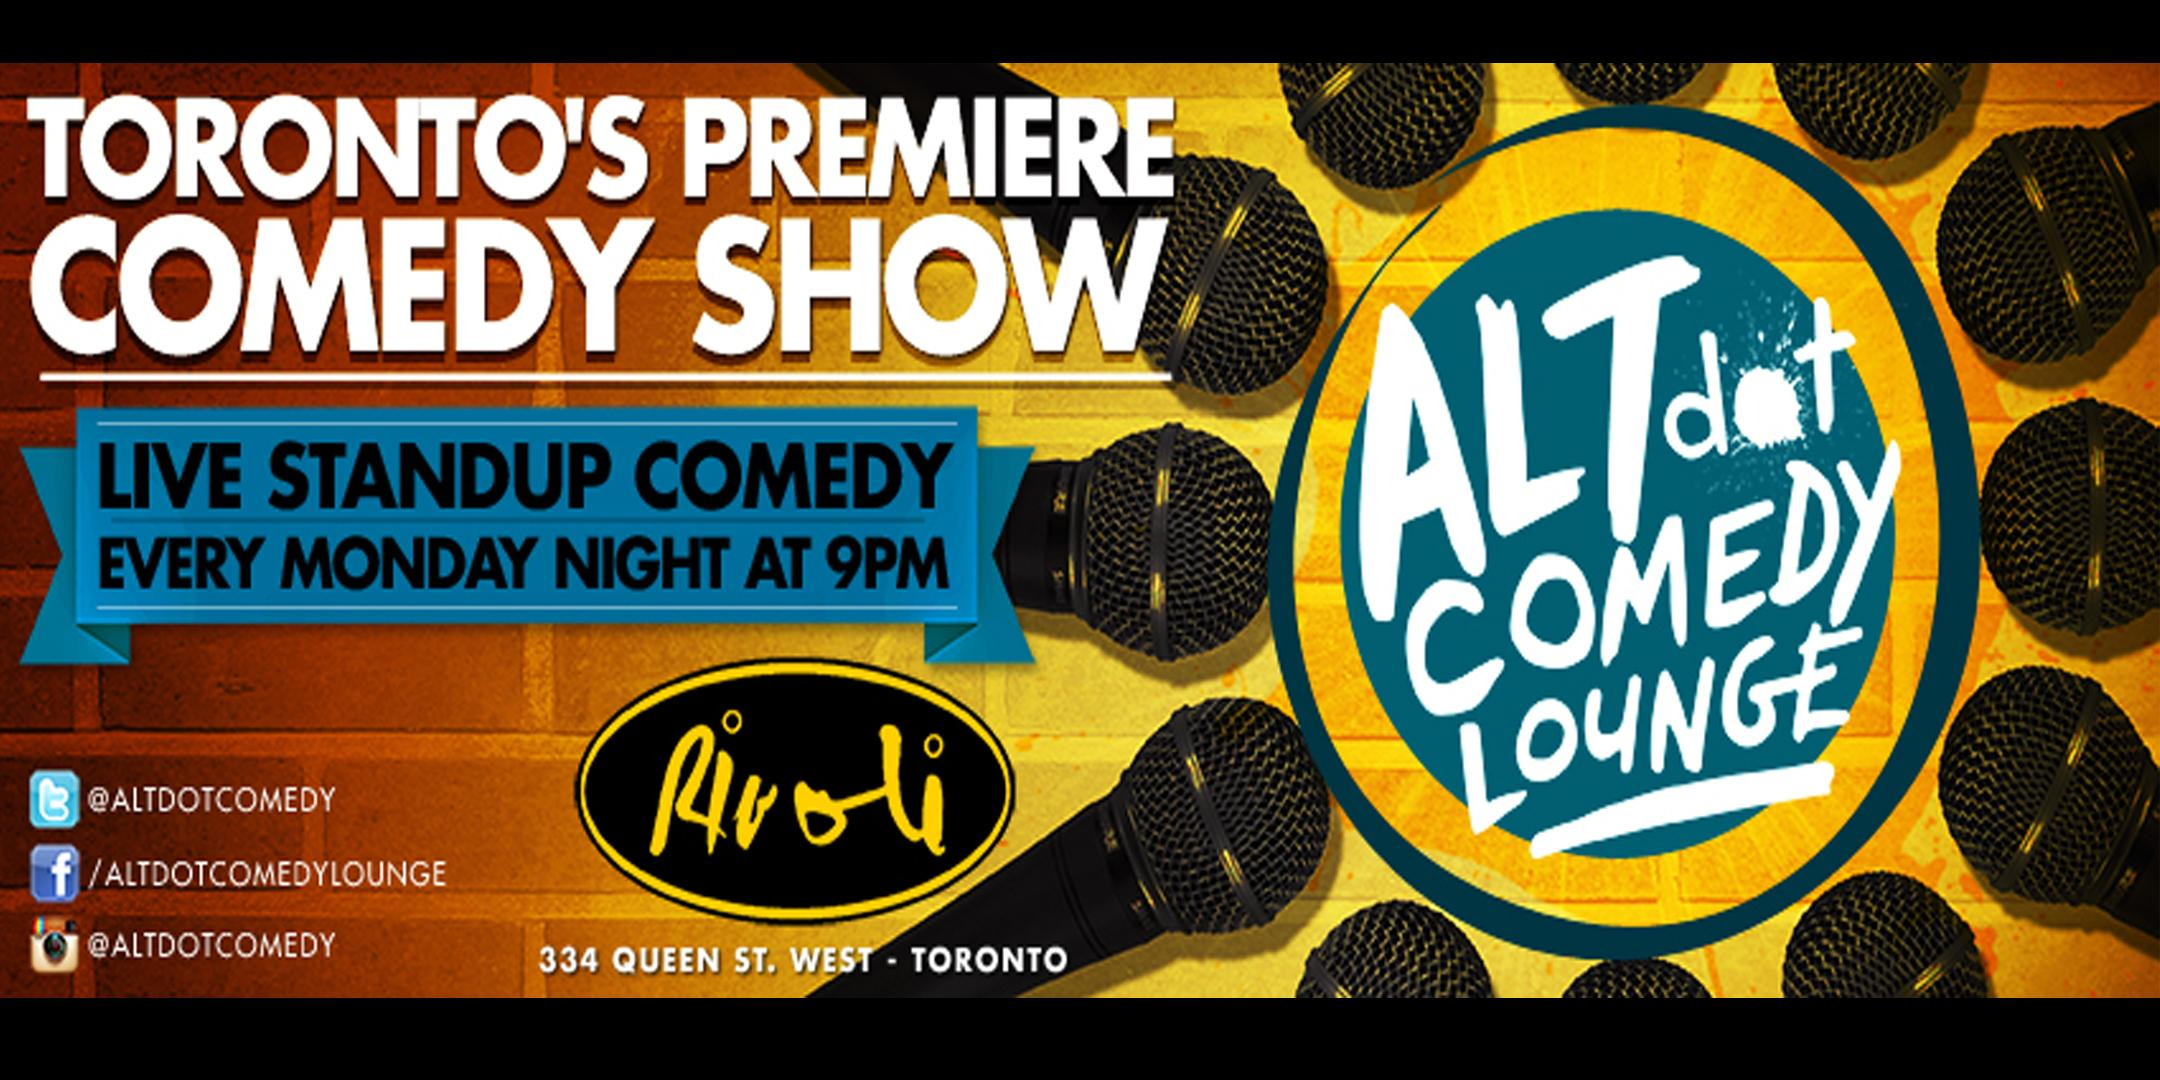 ALTdot Comedy Lounge - June 8 @ The Rivoli